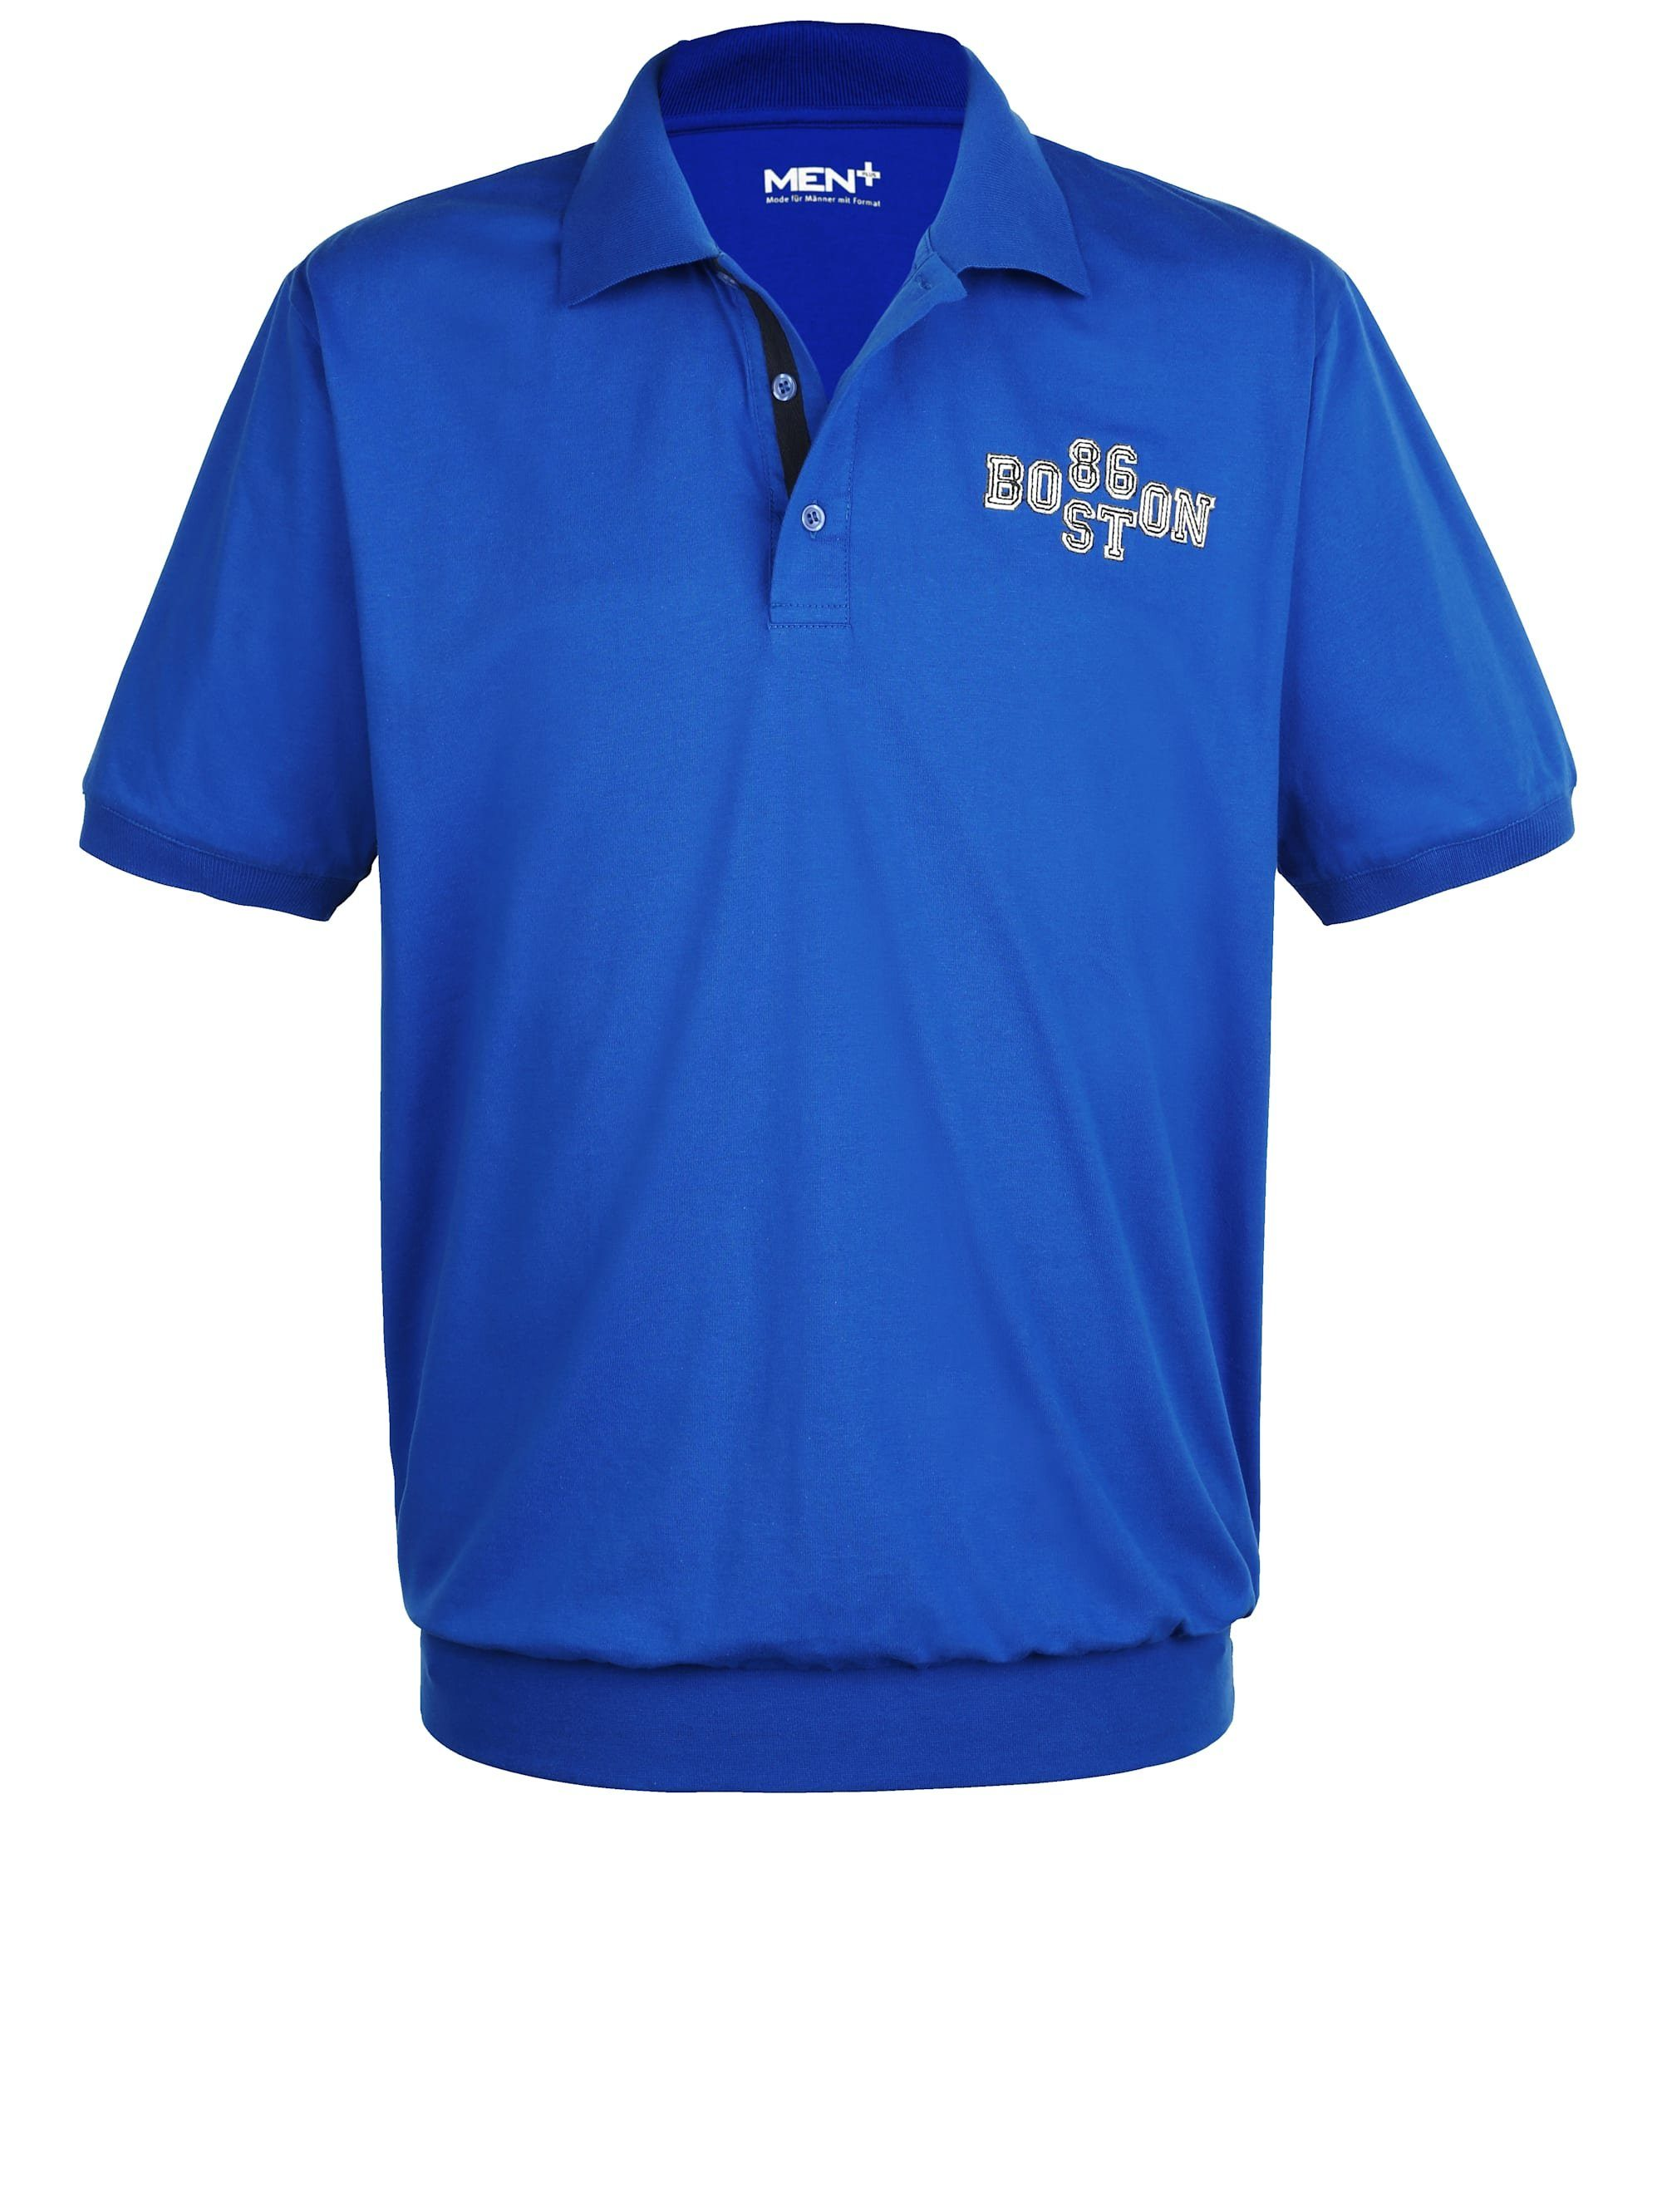 Men Plus by Happy Size Spezialschnitt Poloshirt